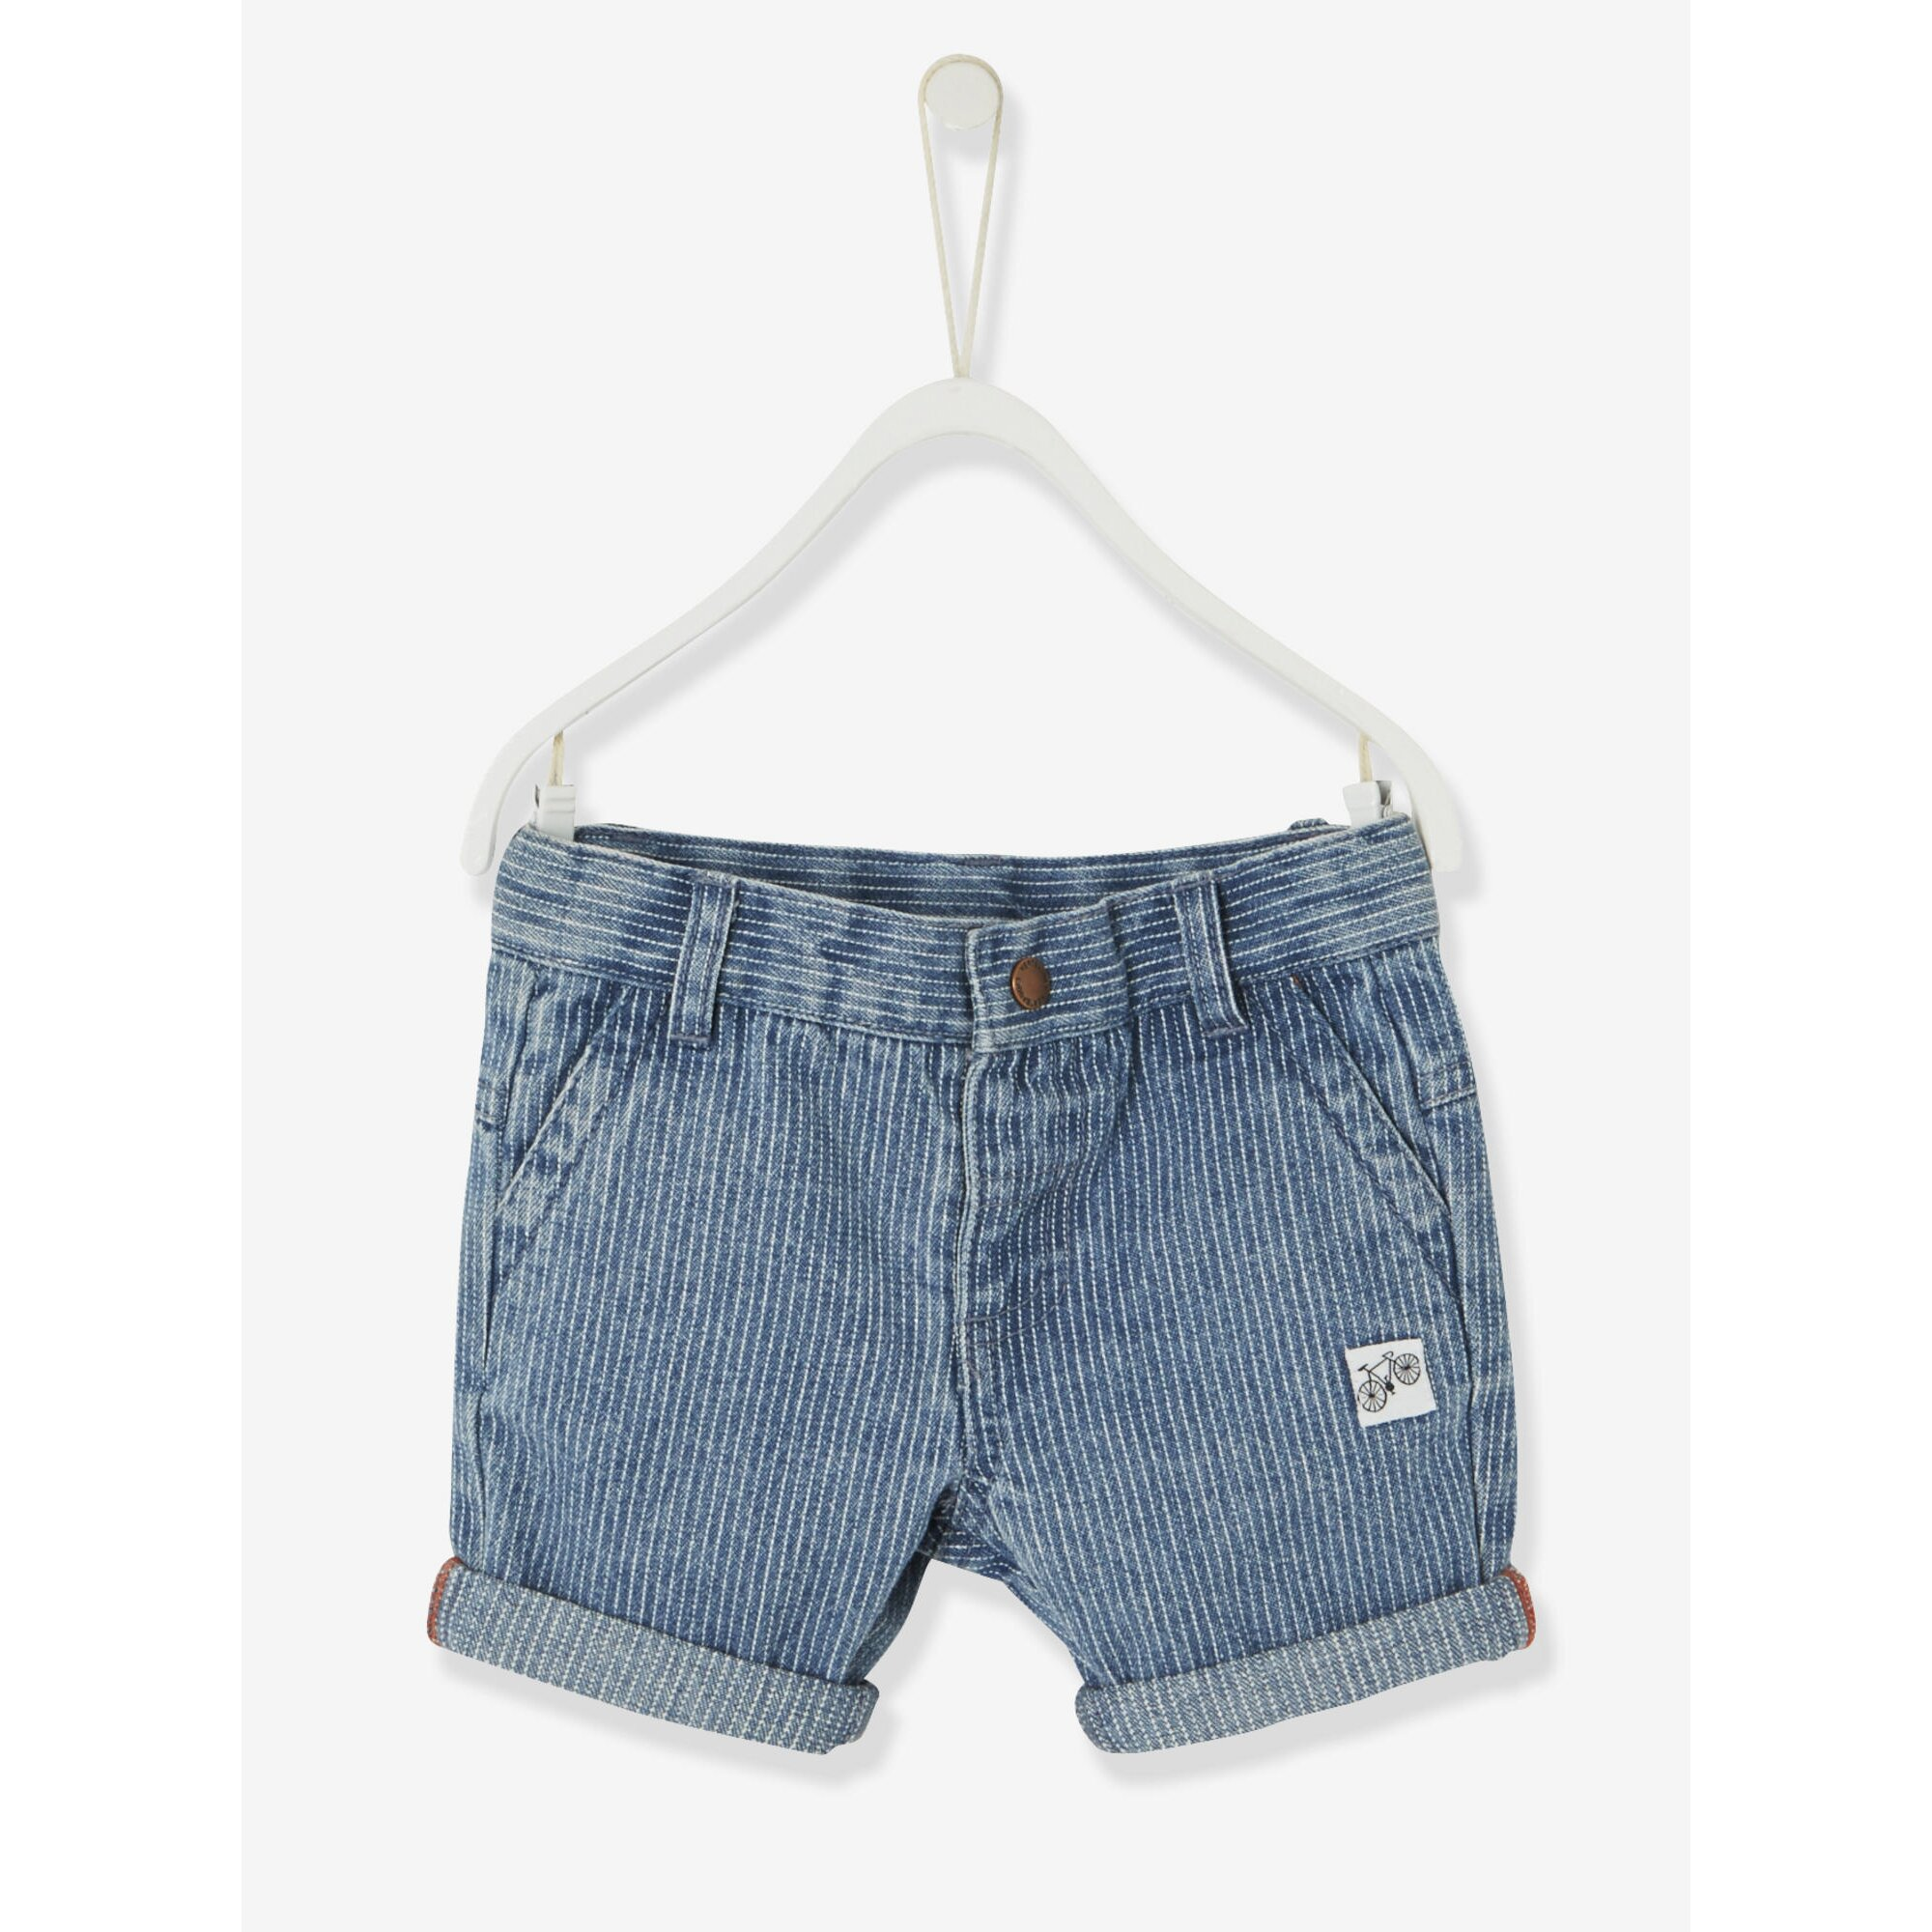 vertbaudet-cap-t-shirt-und-bermudas-baby-jungen, 19.59 EUR @ babywalz-de